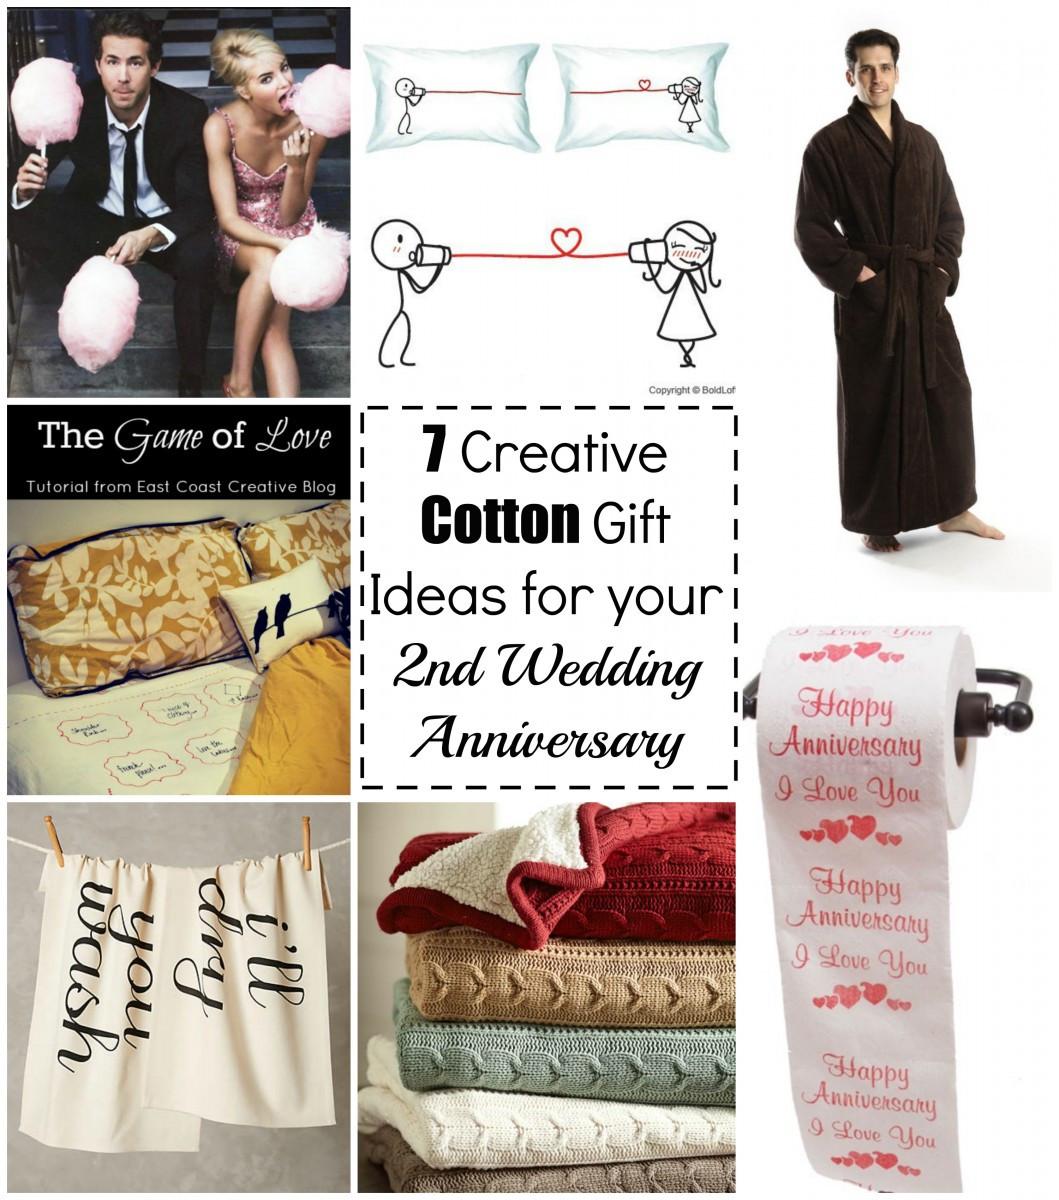 2Nd Wedding Anniversary Gift Ideas  7 Cotton Gift Ideas for your 2nd Wedding Anniversary